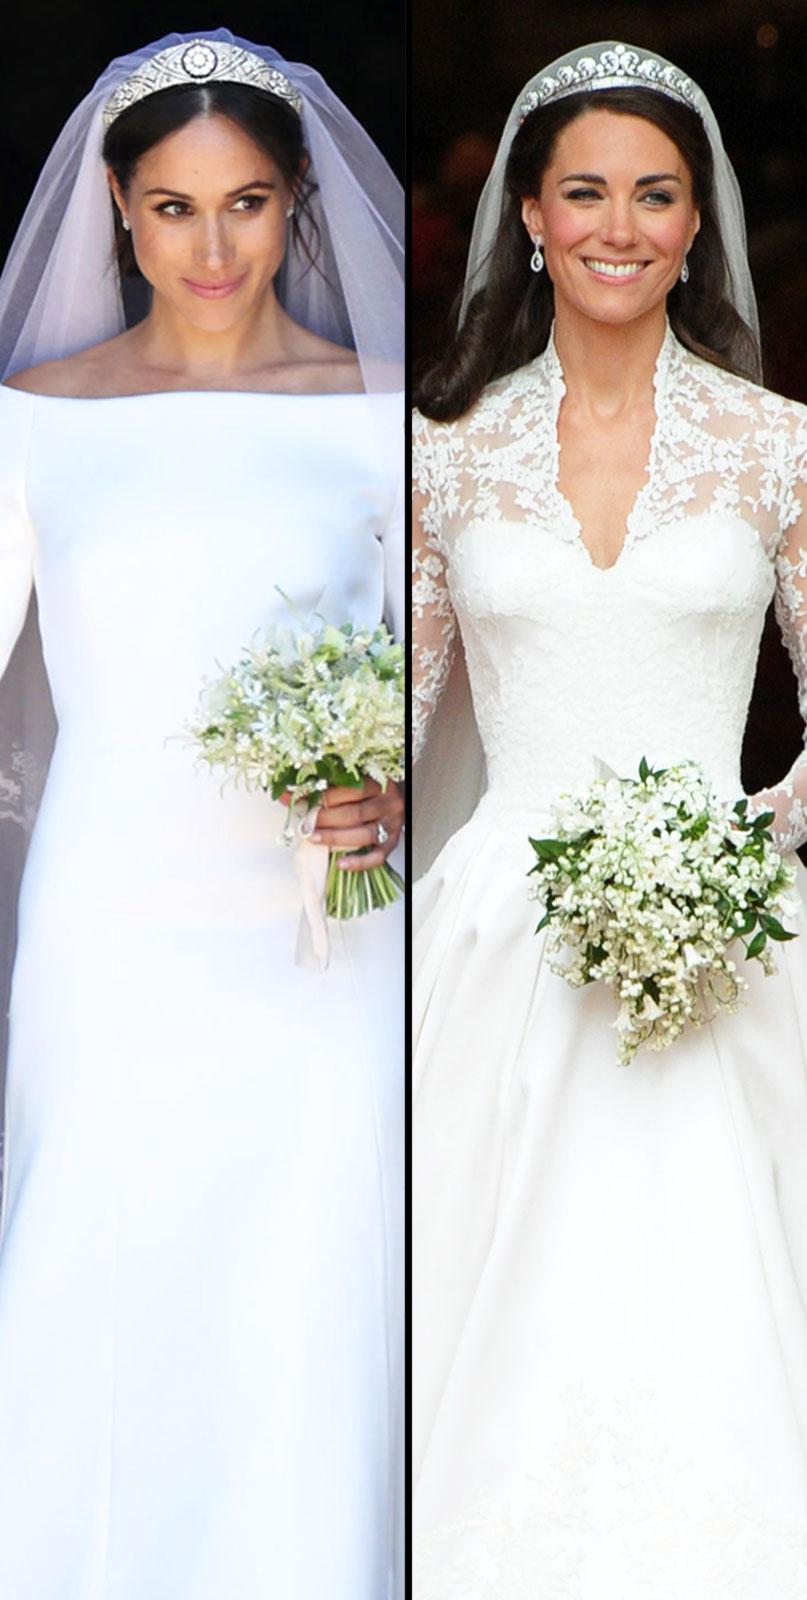 Markle vs. Middleton: Who Had the Best Wedding Dress? on ZIG